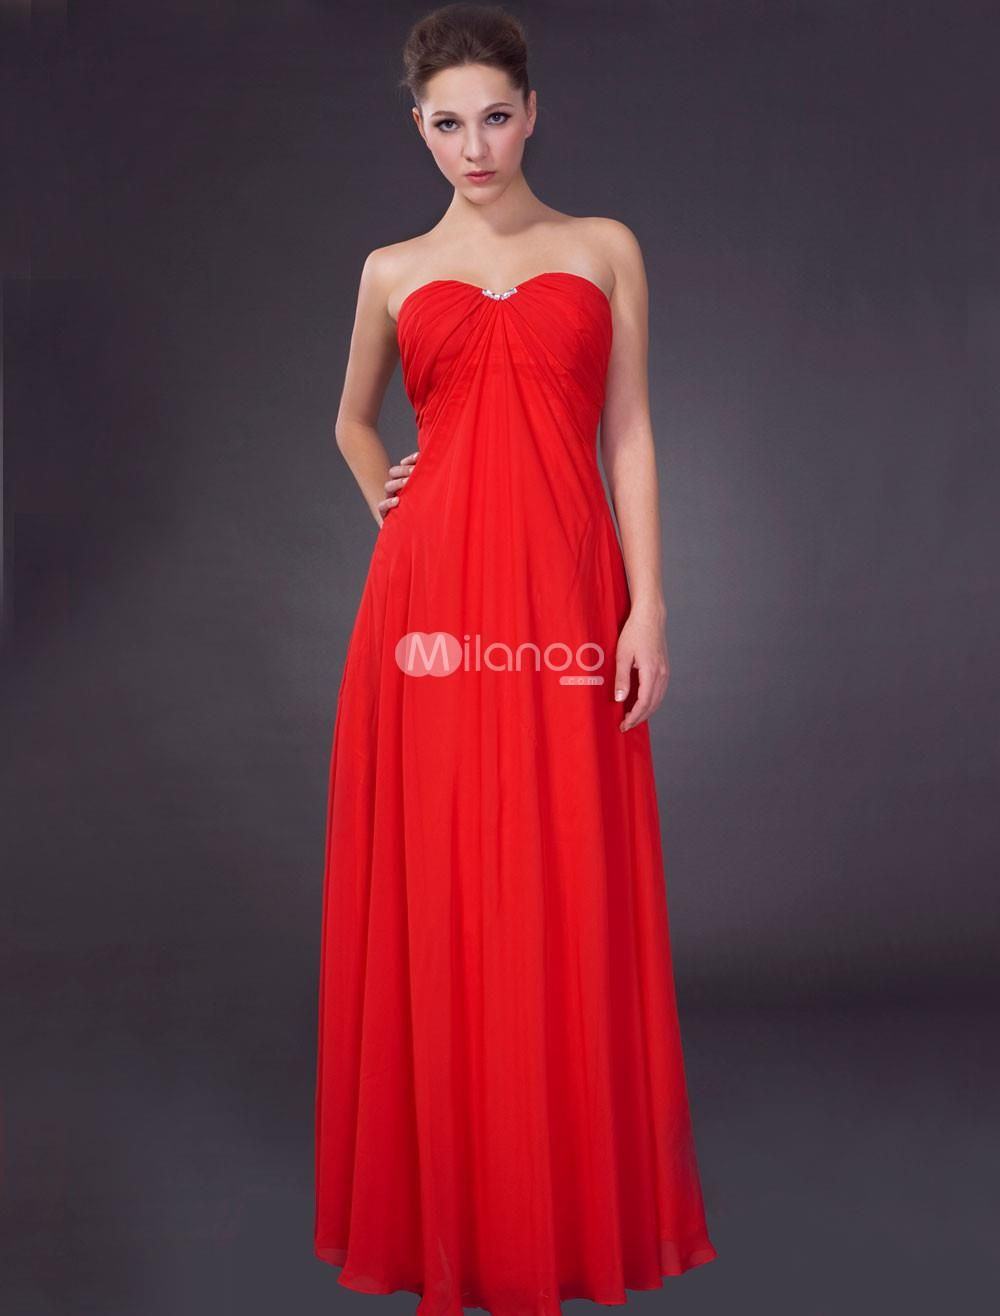 Red empire waist strapless satin chiffon maxi evening gown wearing